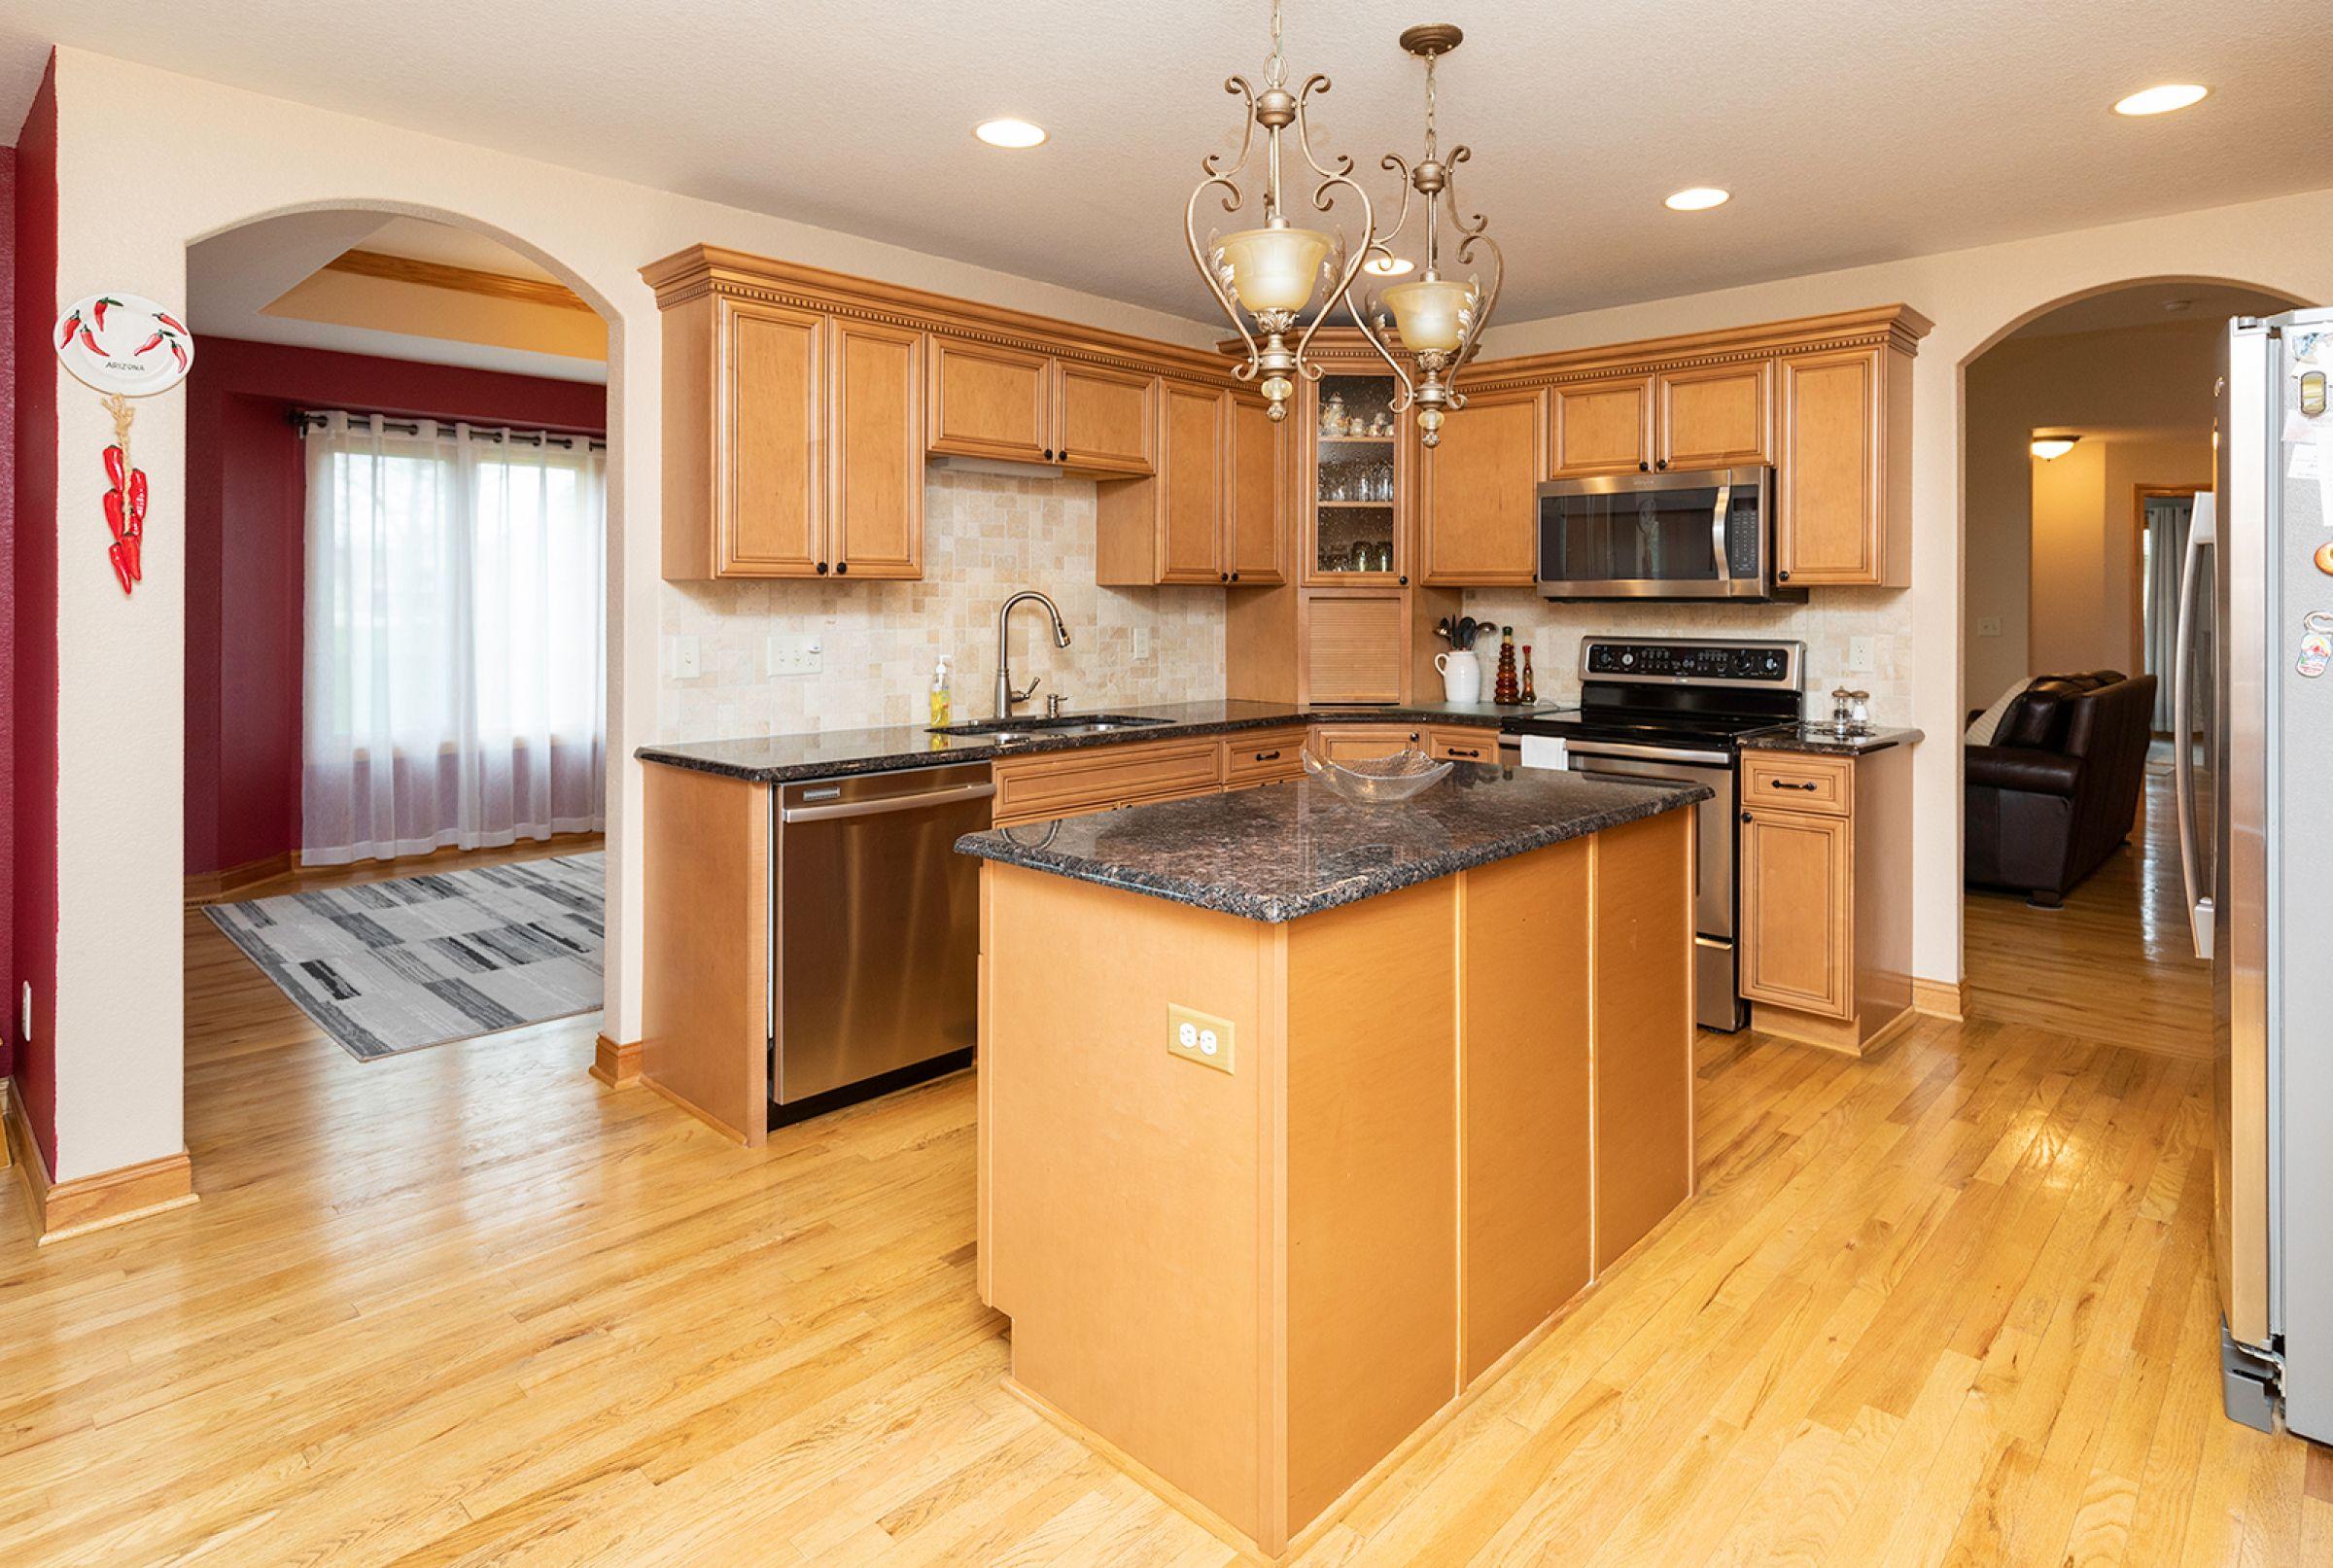 residential-polk-county-iowa-0-acres-listing-number-15458-1-2021-04-11-140822.jpg